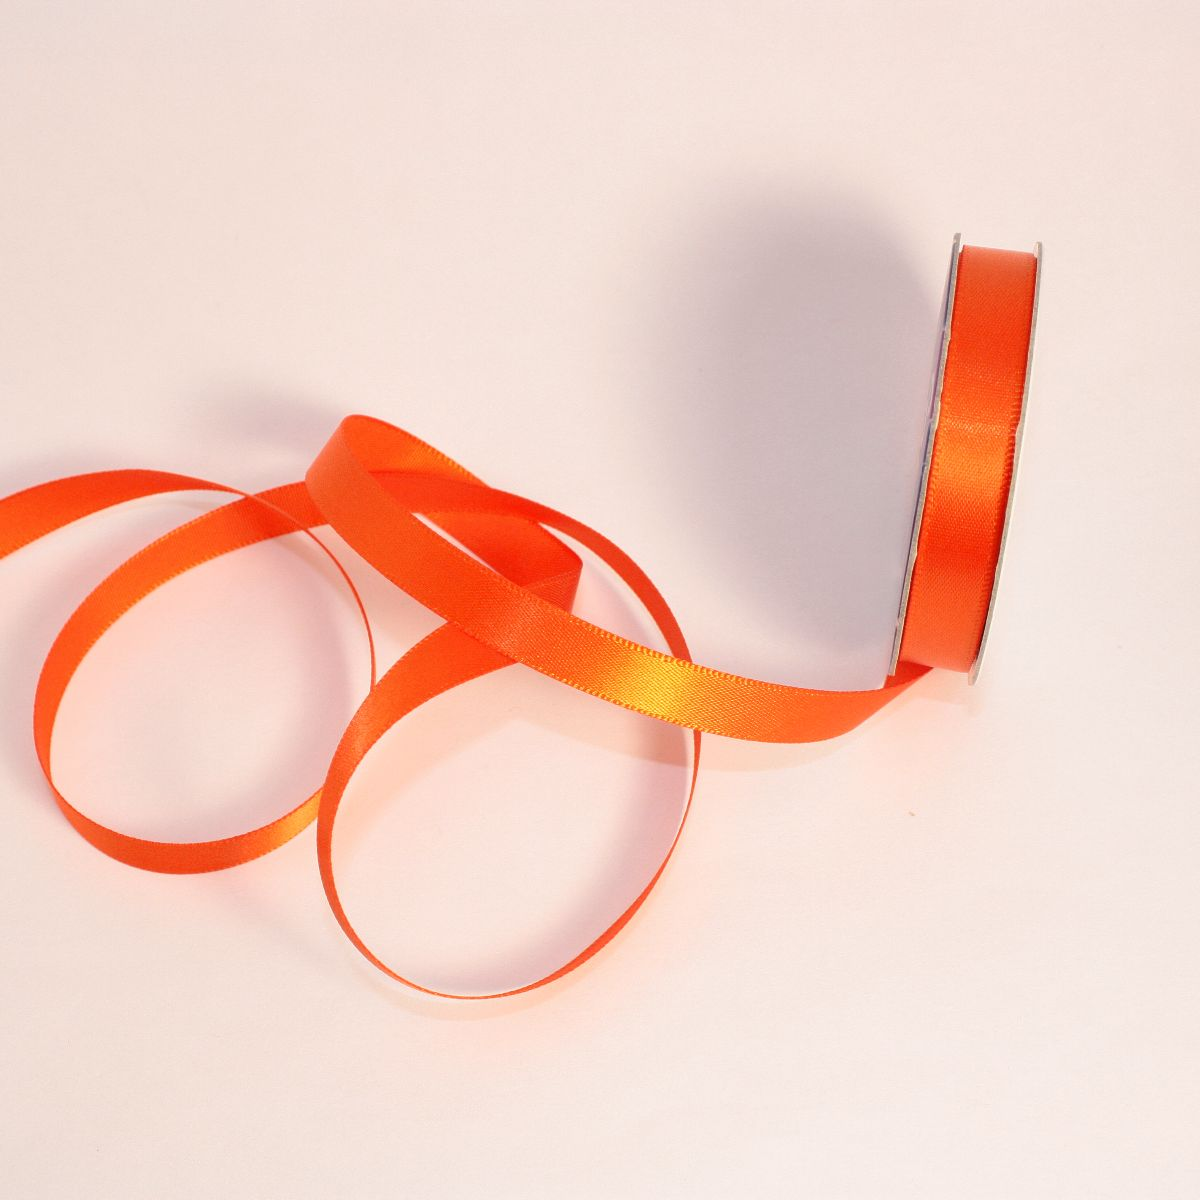 Ruban satin en bobine orange sanguine 9 mm